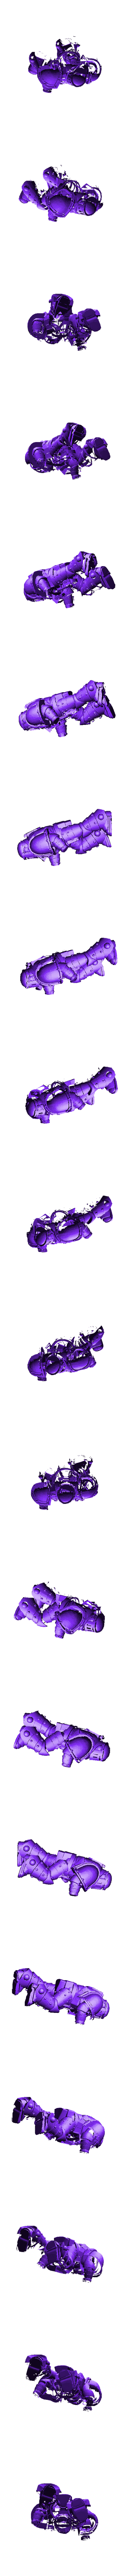 Marine_6_Split.stl Download free STL file Assault Marine Builder Berserker, Tzaangors, Blade Cabal • 3D printable template, Mazer